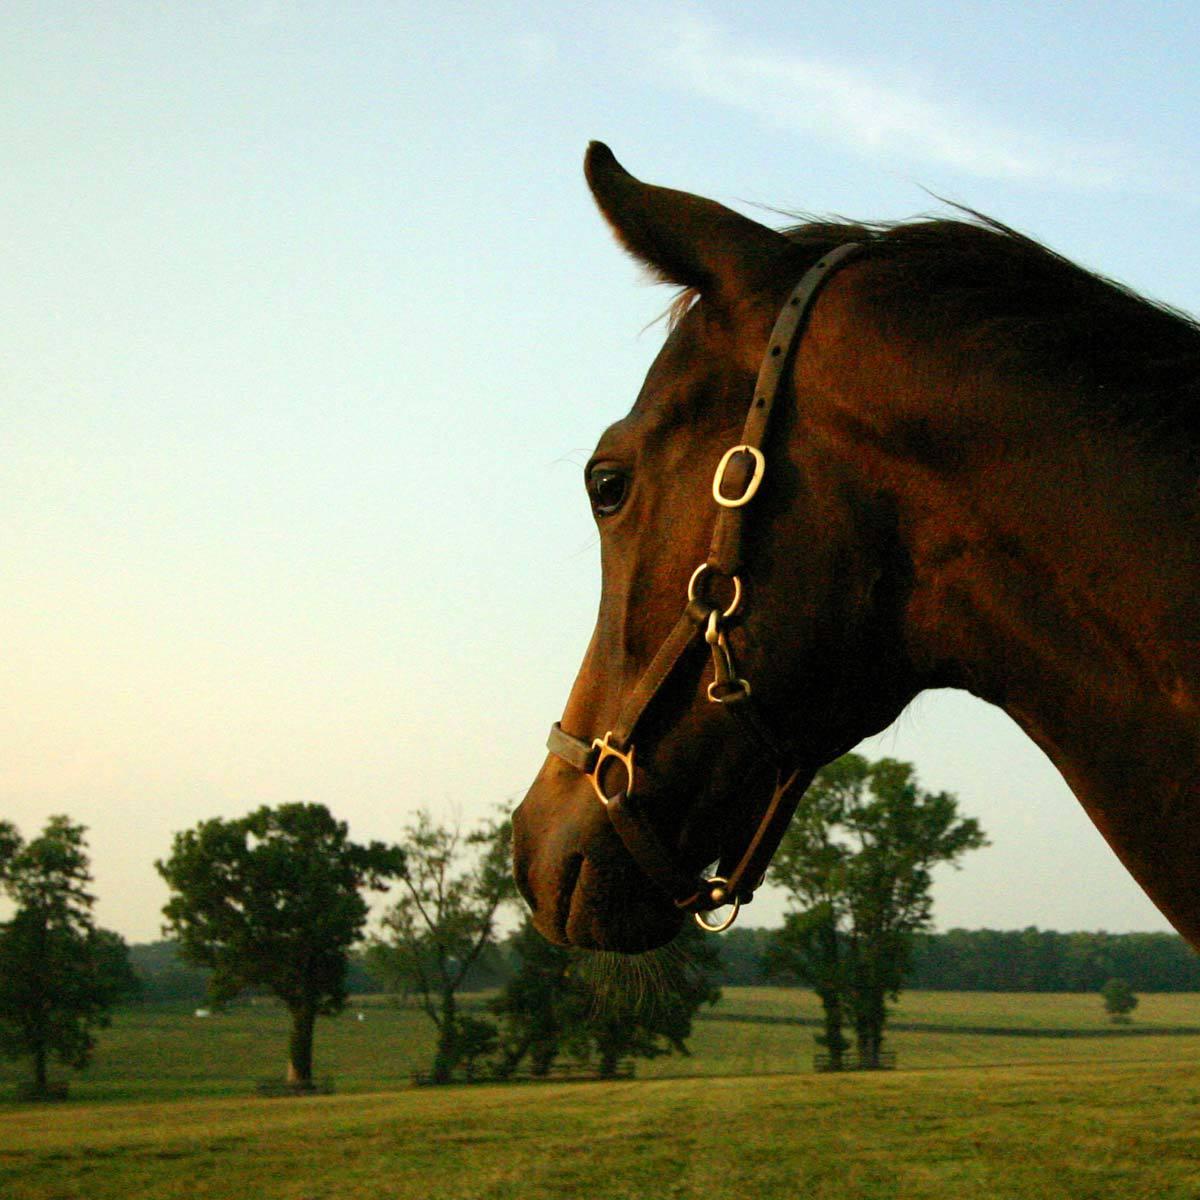 solo-horse1.jpg